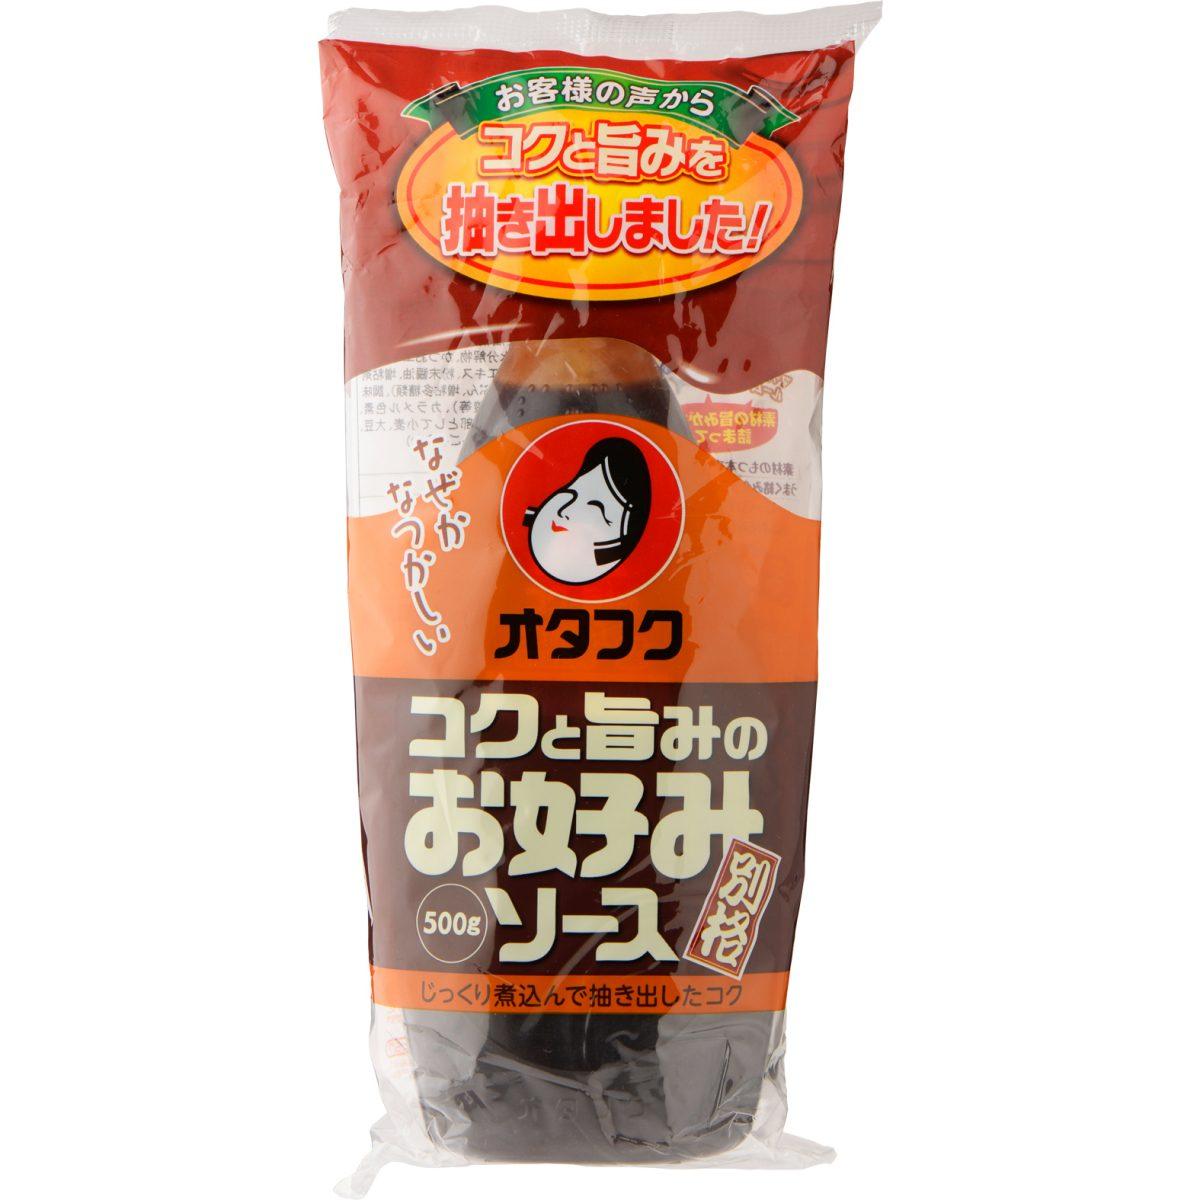 Otafuku Sauce